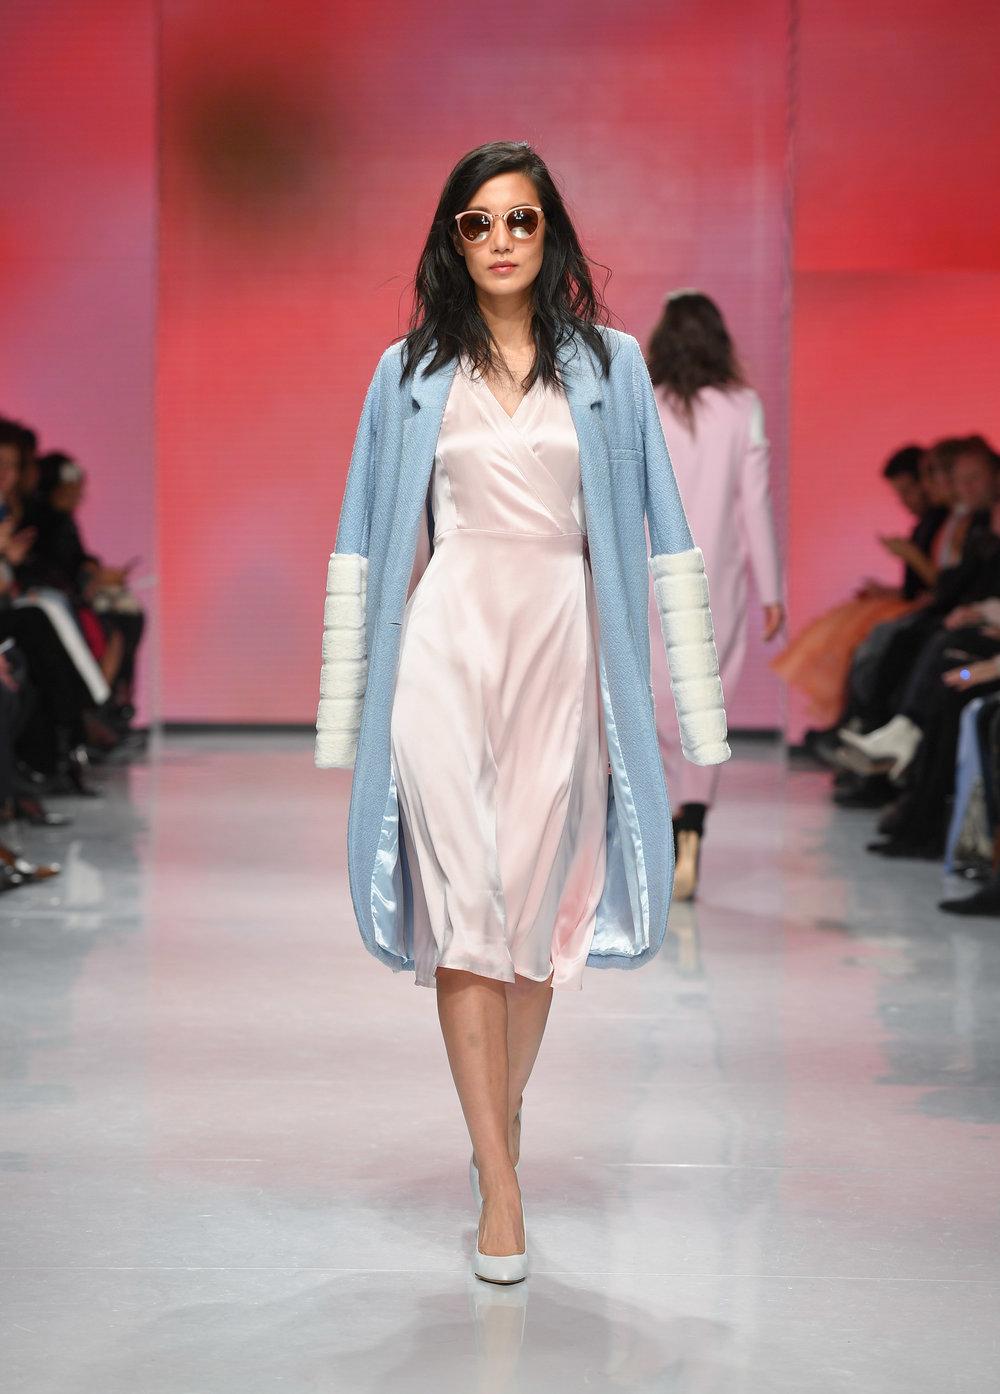 e2f4b-hilary-macmillan-toronto-fashion-week-february-2018-yorkville-village-1.jpg